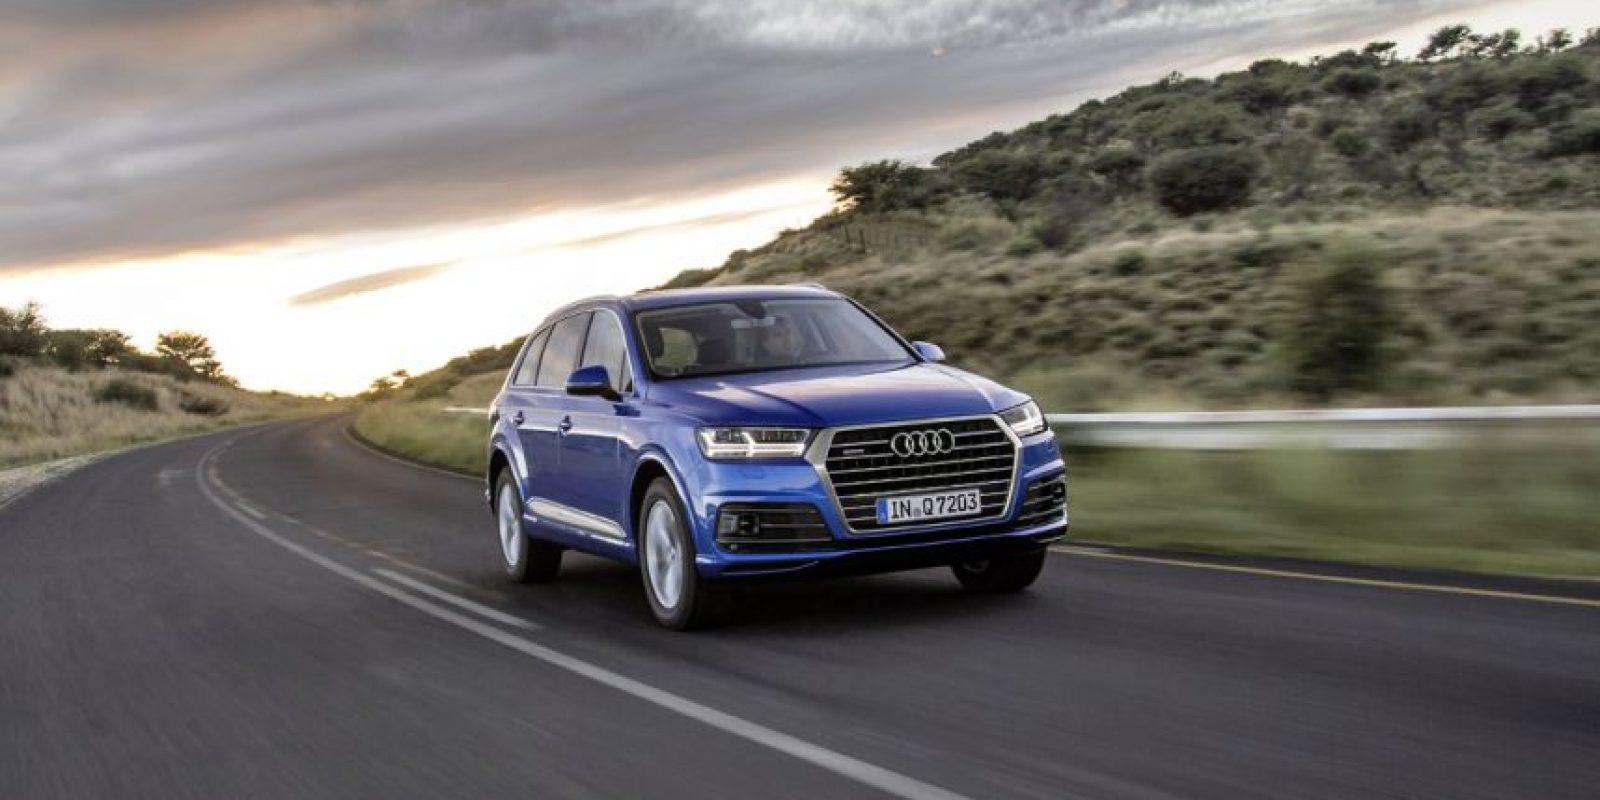 Audi Q7. Foto: cortesía de Staffeld & Co